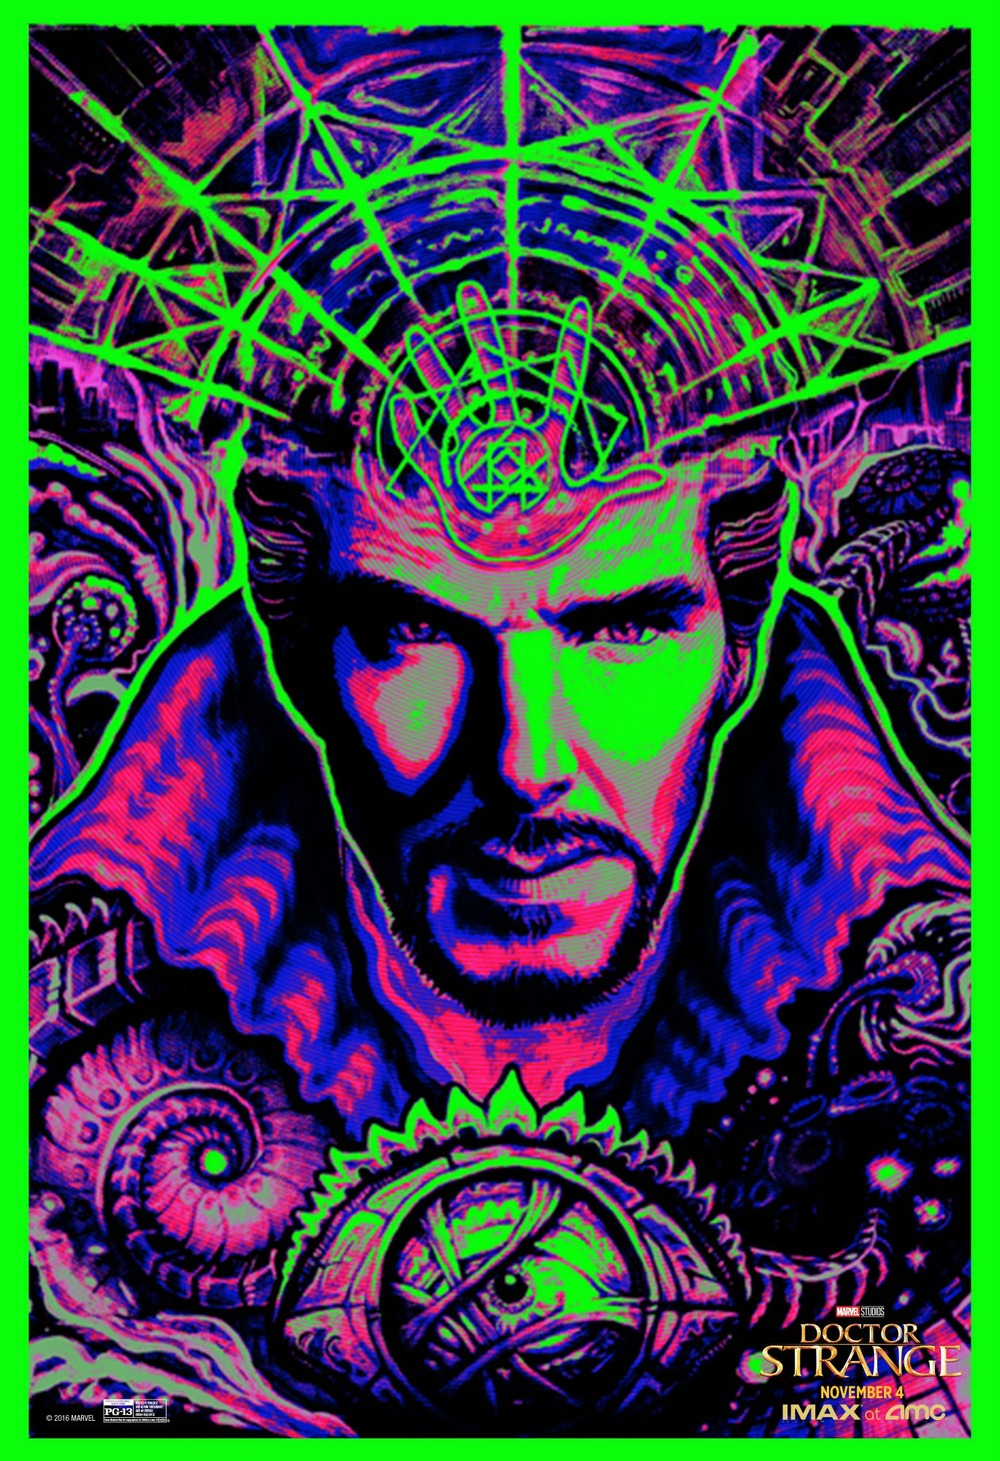 Doctor Strange DVD Release Date | Redbox, Netflix, iTunes, Amazon